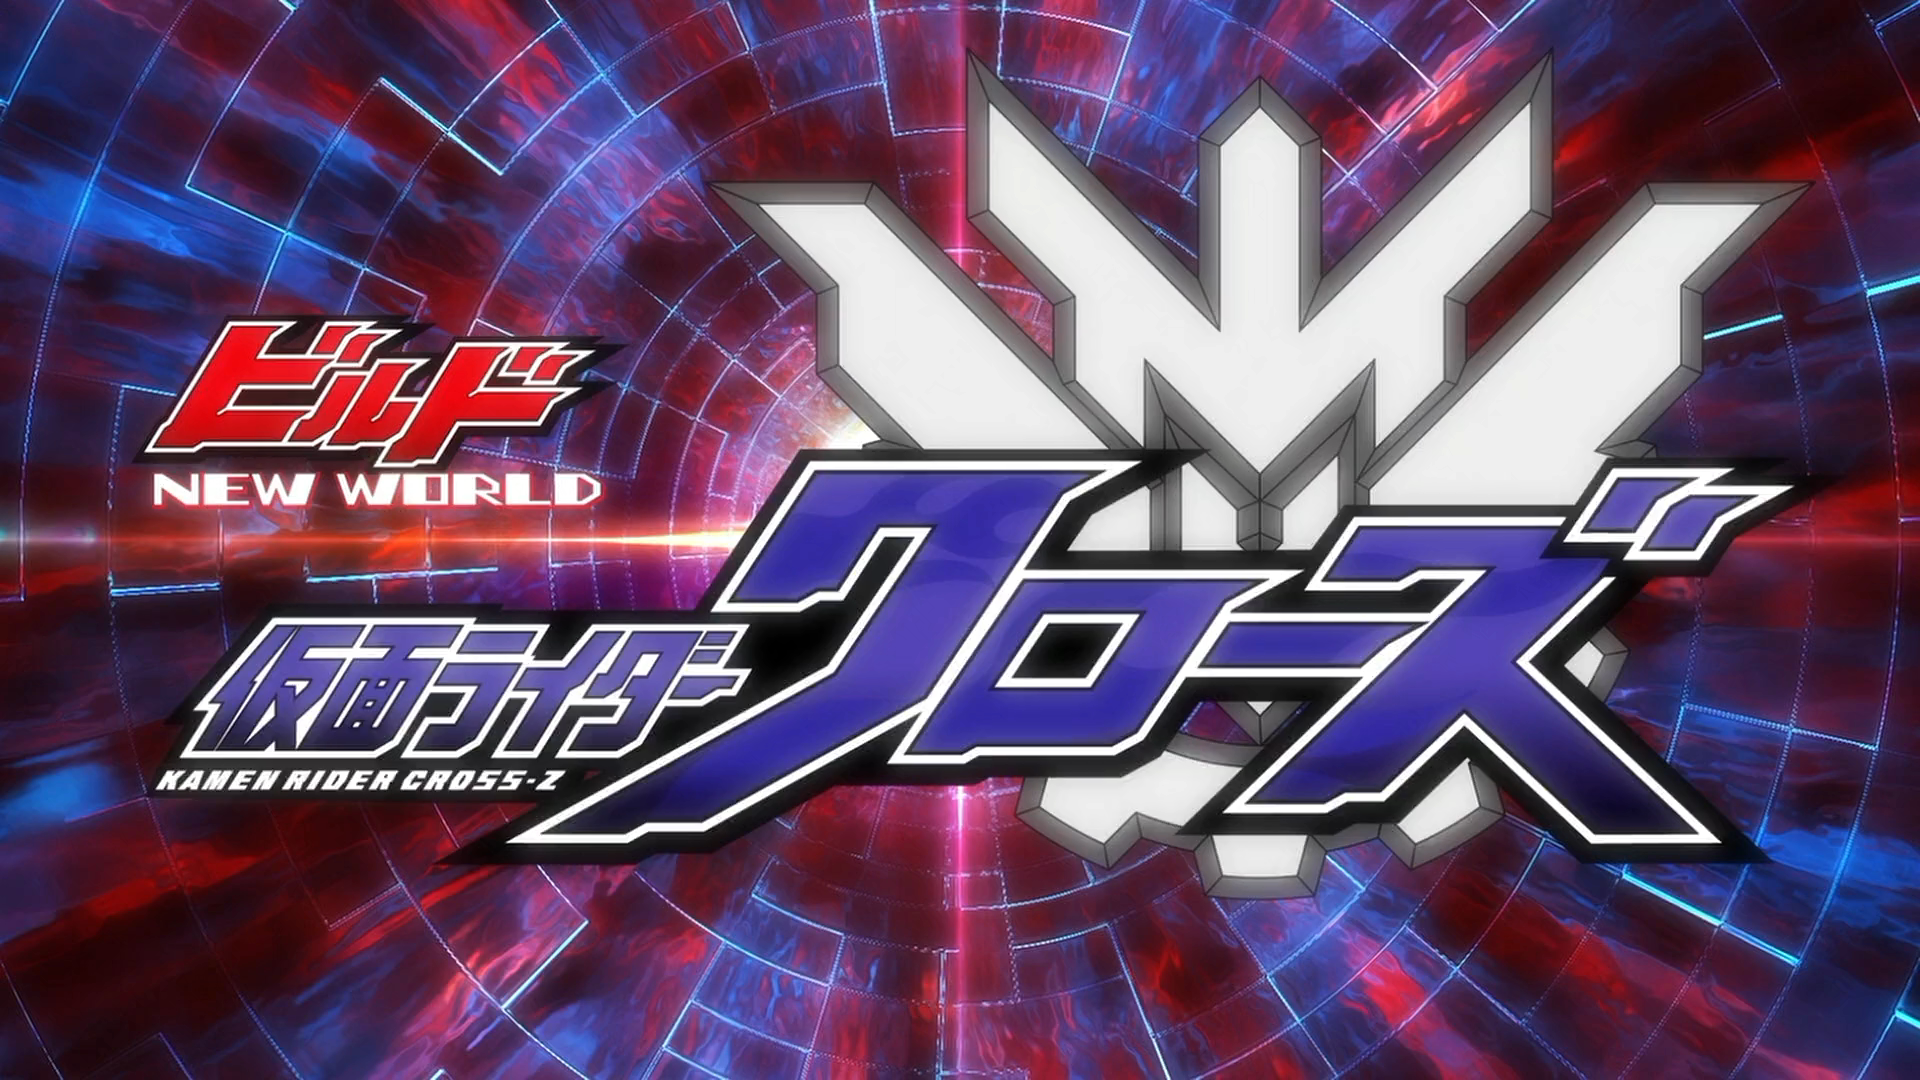 Kamen Rider Build New World Kamen Rider Cross Z Kamen Rider